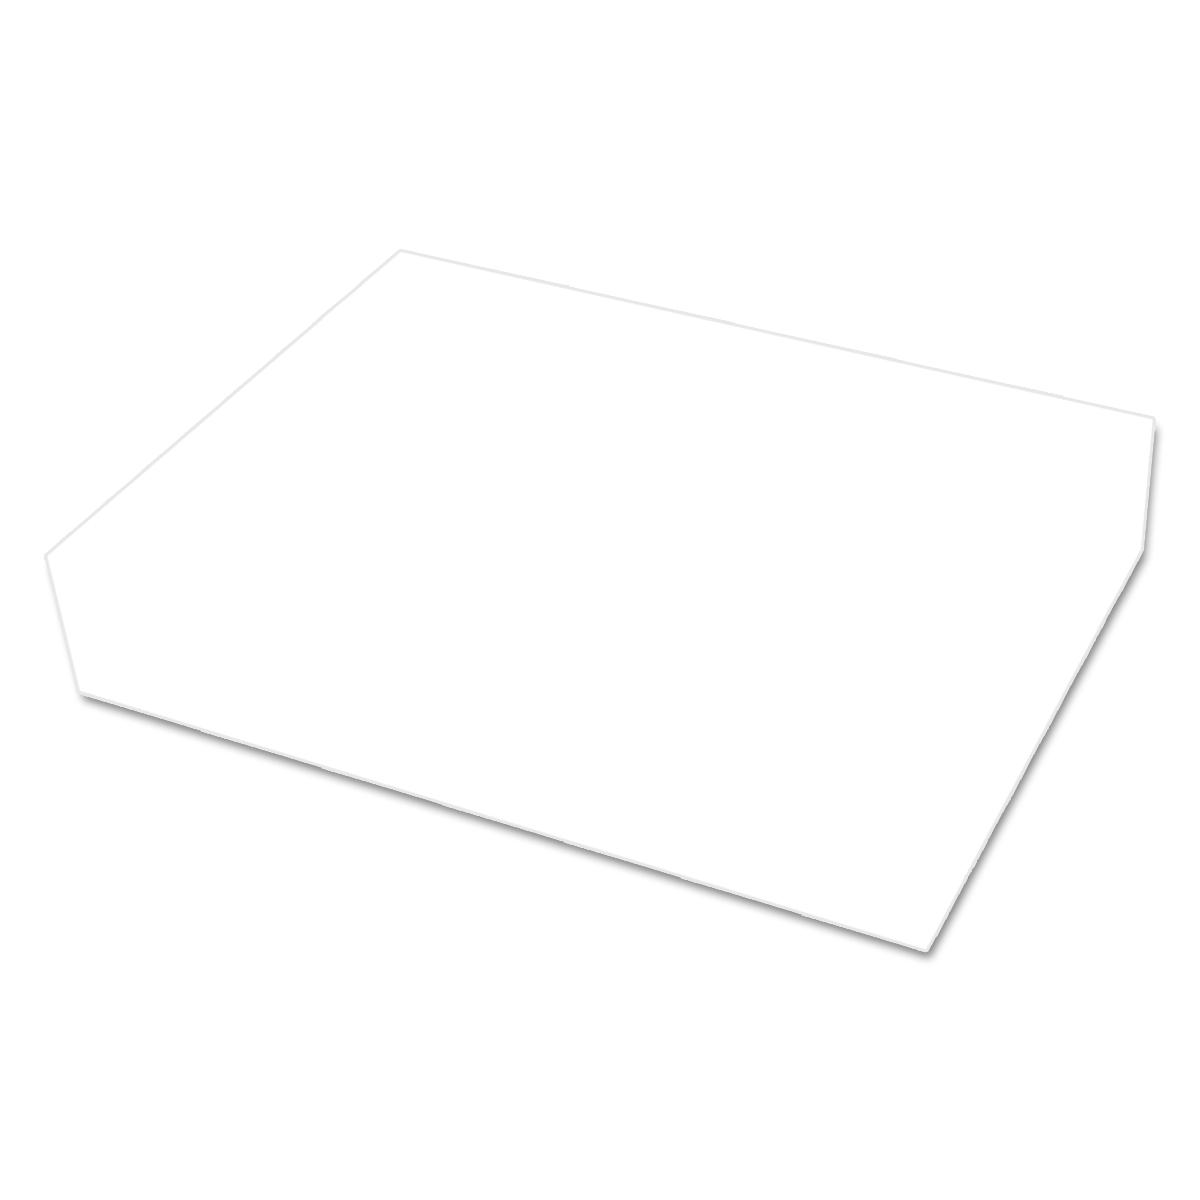 kopierpapier druckerpapier in 3 qualit ten papier a4 80g 500 blatt oder 2500 ebay. Black Bedroom Furniture Sets. Home Design Ideas